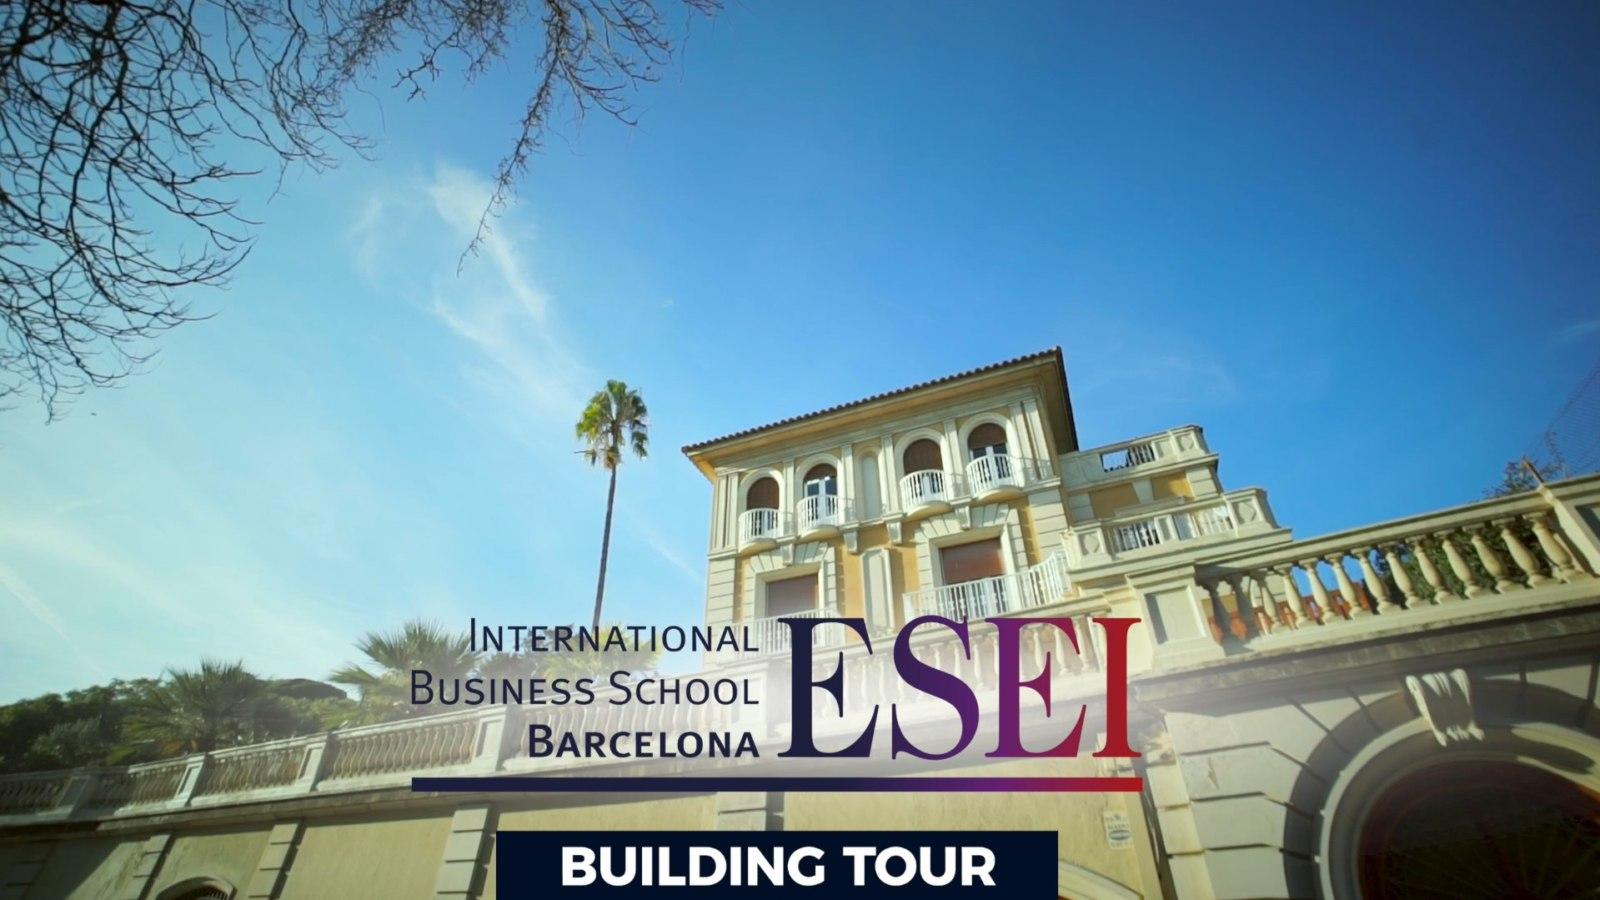 TRƯỜNG KINH DOANH ESEI (ESEI INETRNATIONAL BUSINESS SCHOOL)